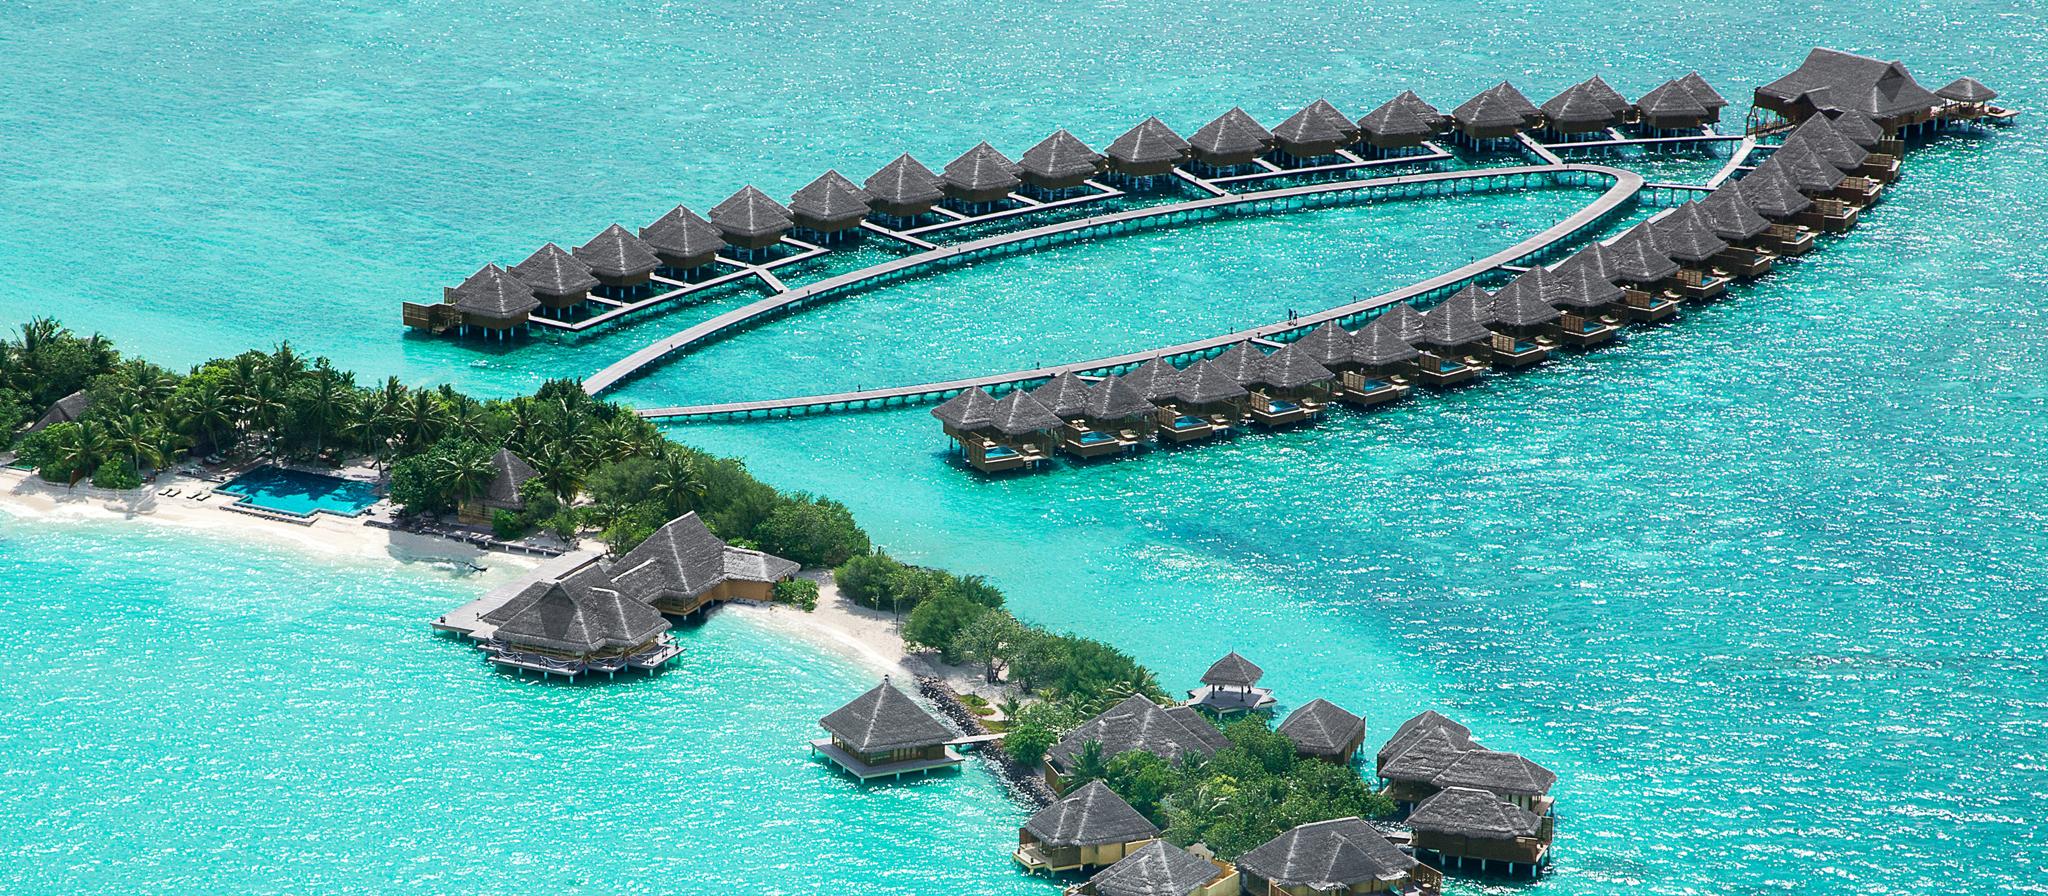 Taj Exotica Resort & Spa Backgrounds, Compatible - PC, Mobile, Gadgets| 2048x896 px